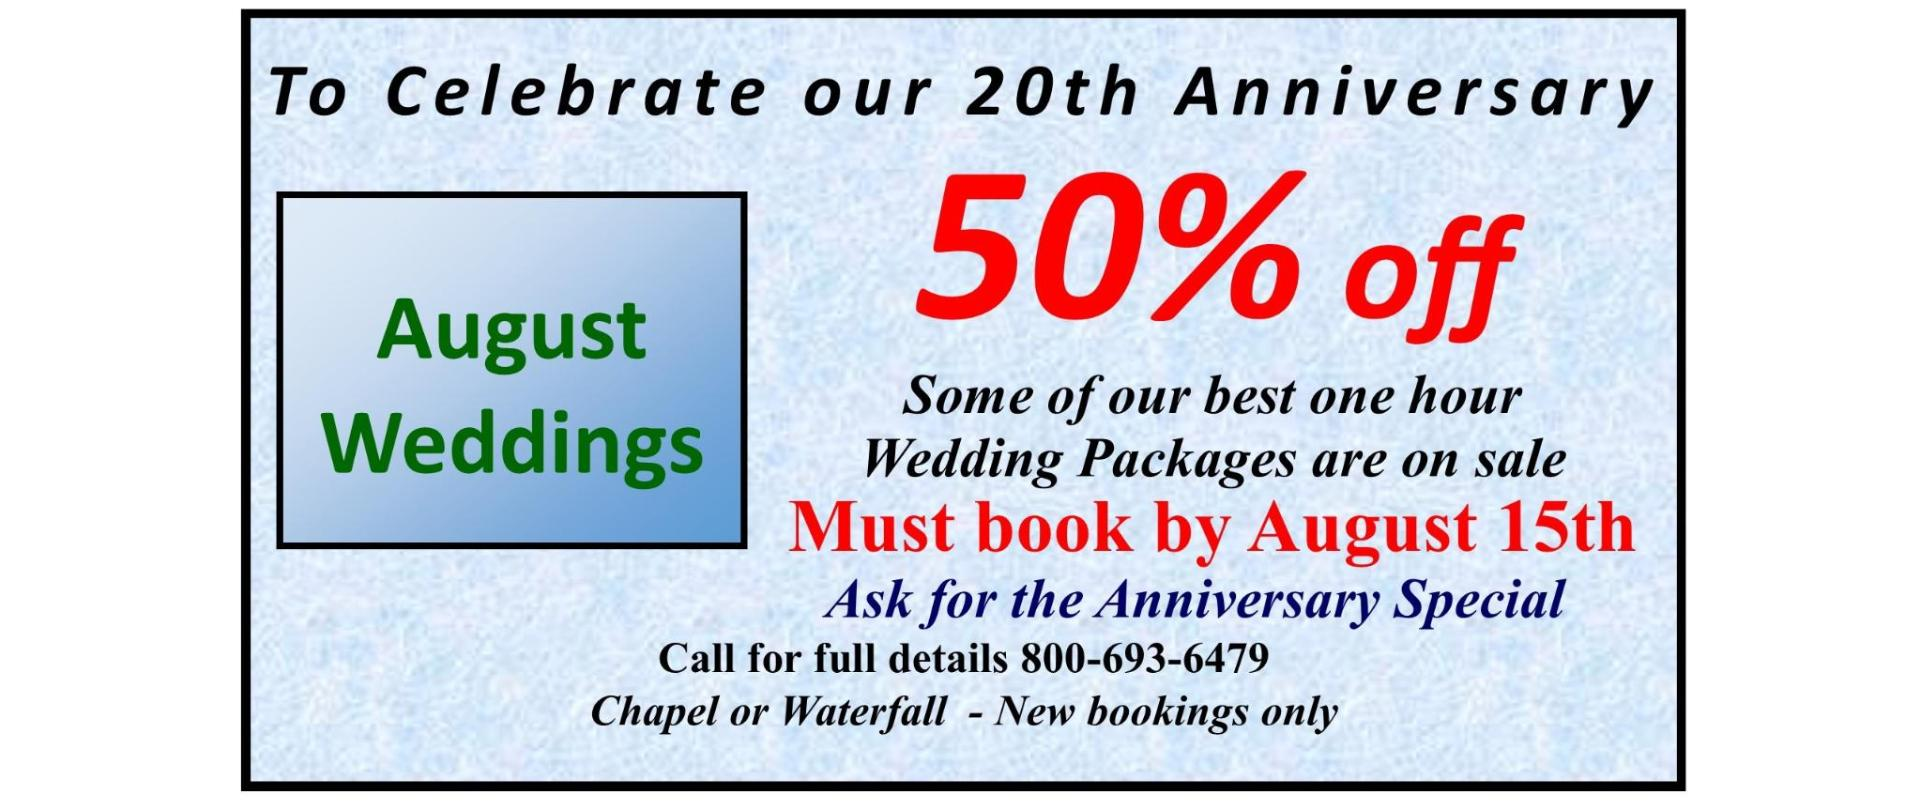 20 year anniversary coupon August 15.jpg